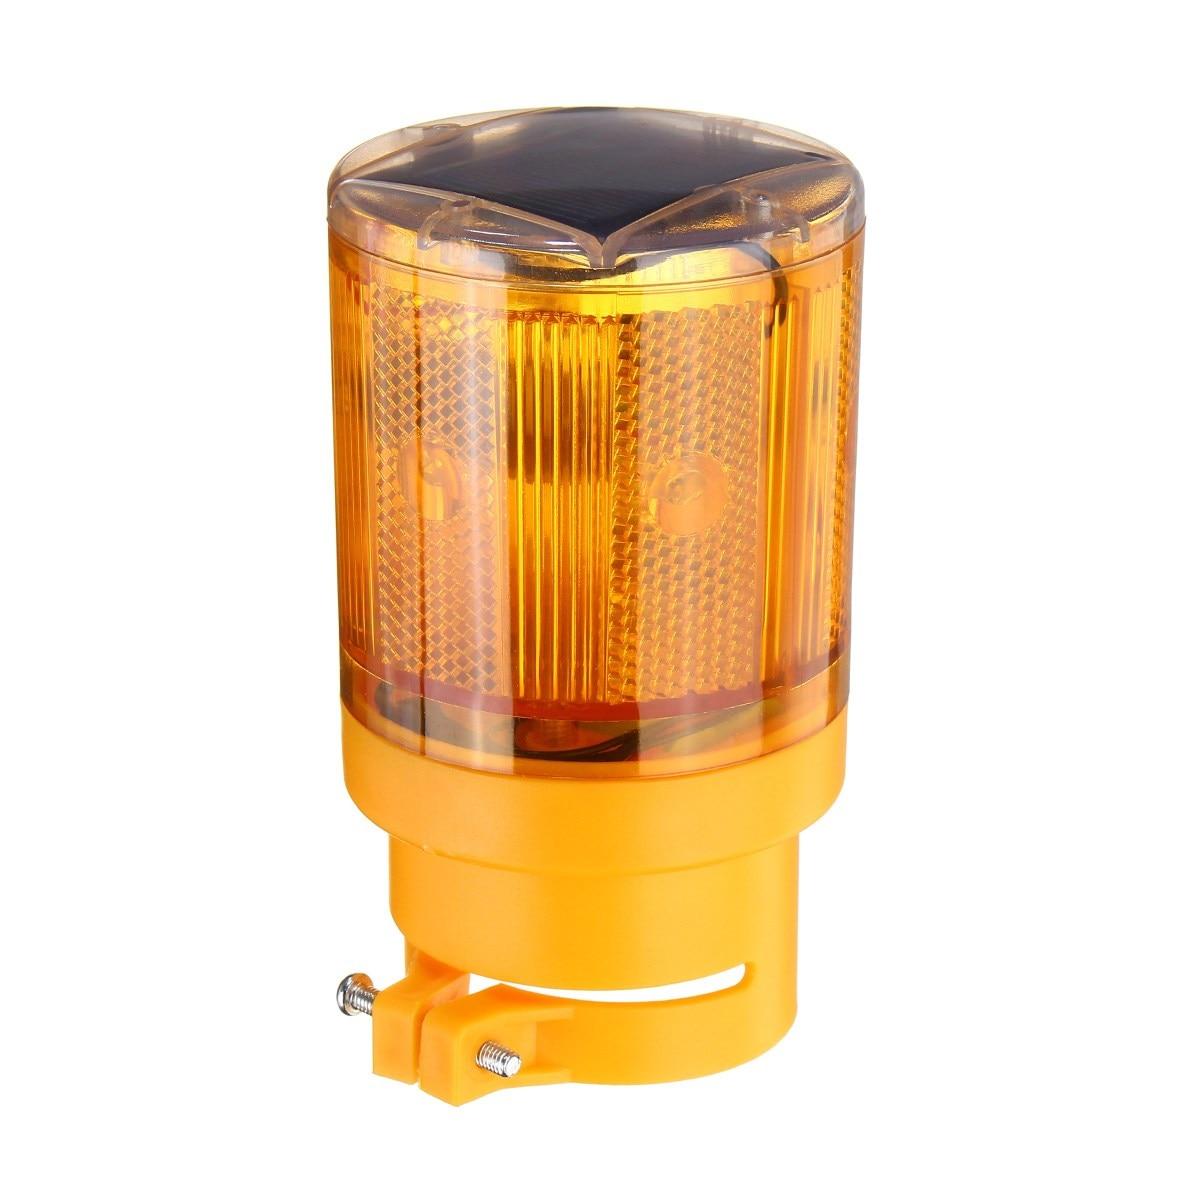 Safurance Solar Powered LED Traffic Strobe Warning Lights Flicker Beacon Road Sign Lamp Roadway Safety цена и фото